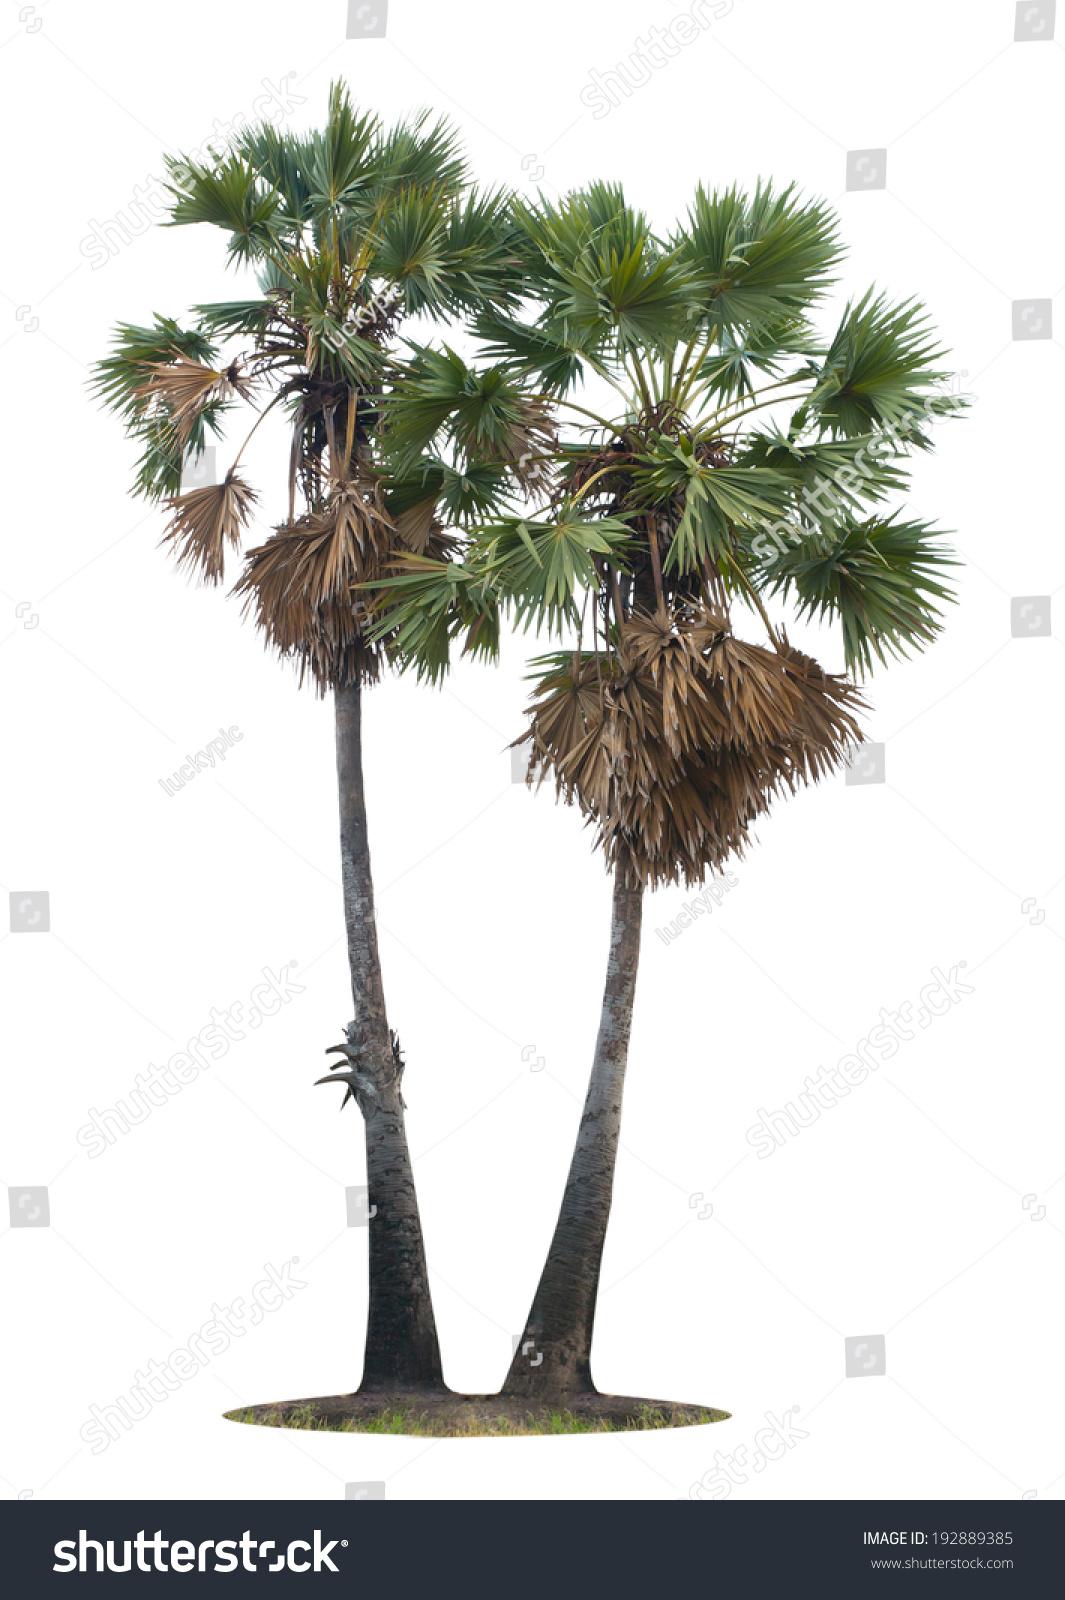 palm tree white - photo #25